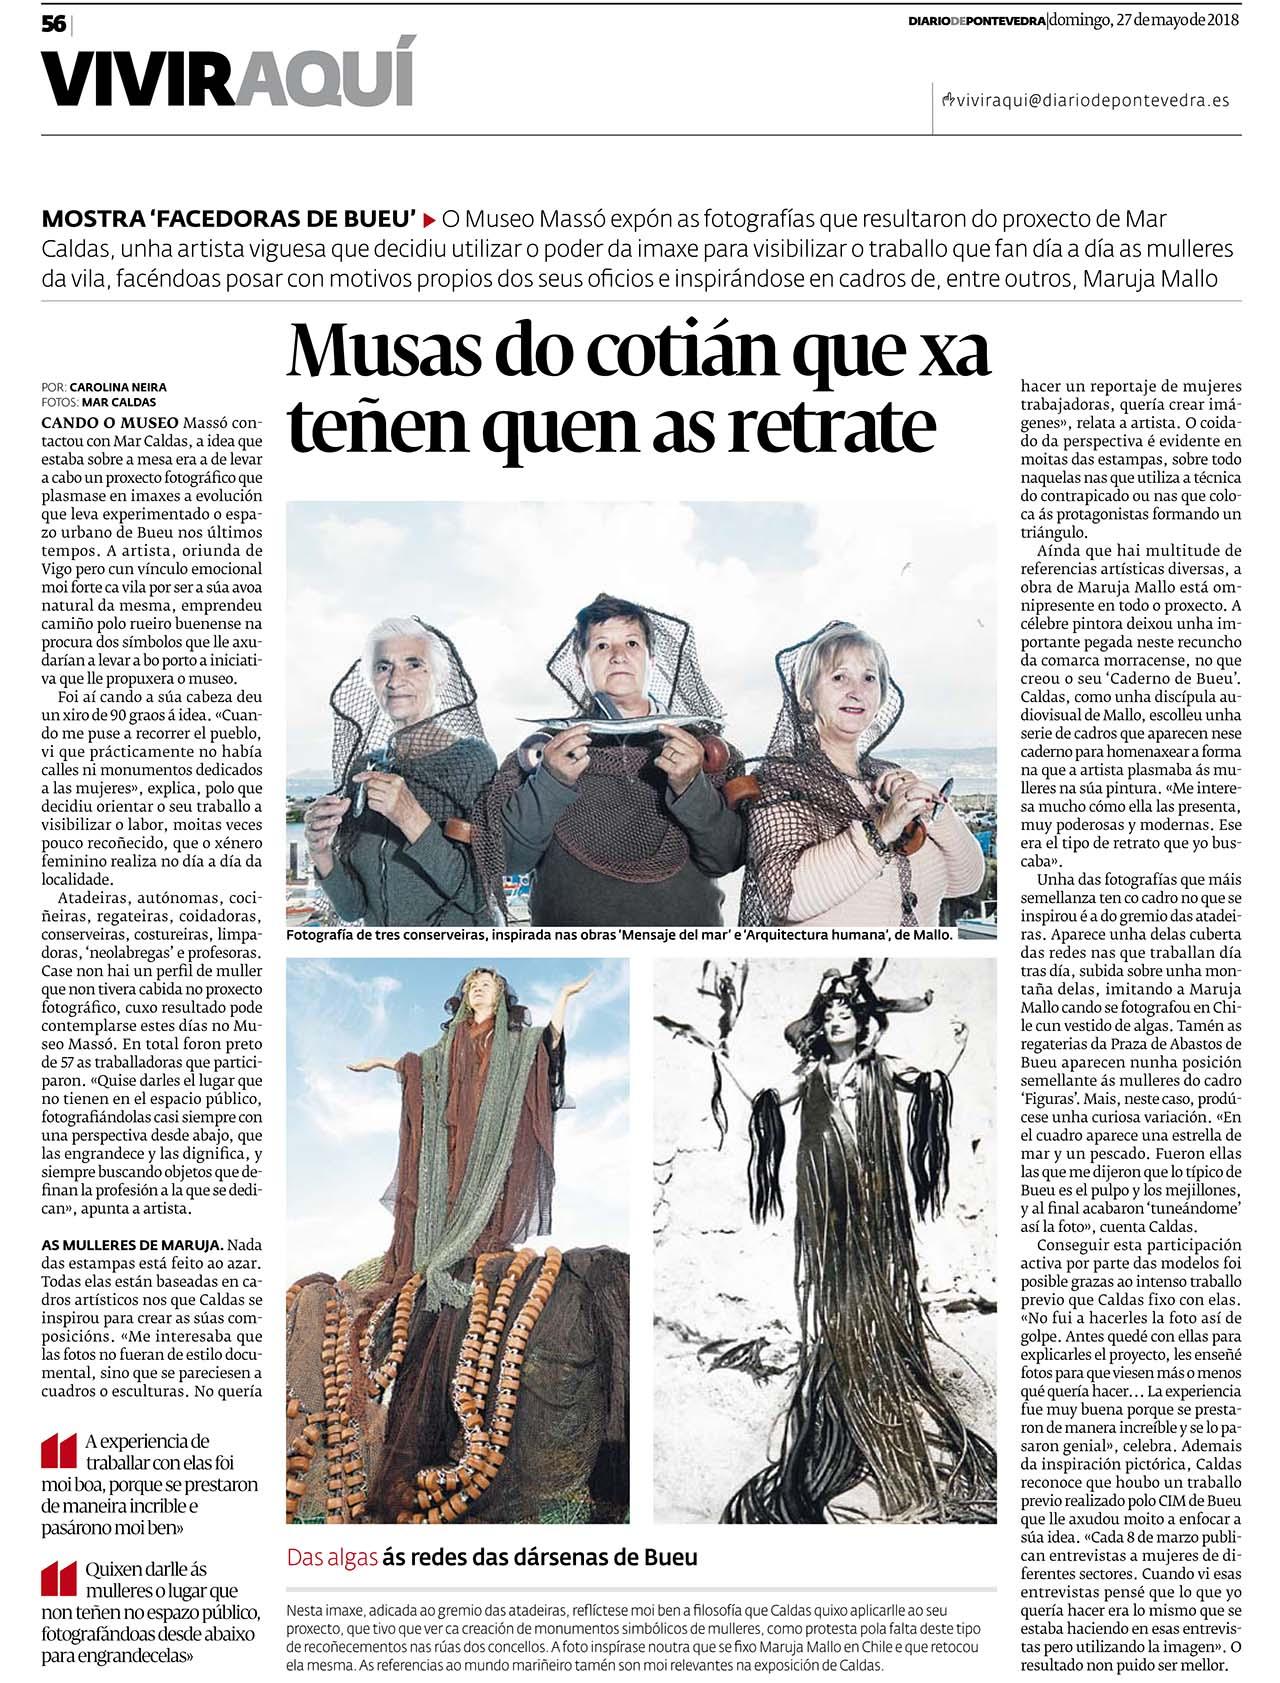 Facedoras de Bueu - Diario de Pontevedra